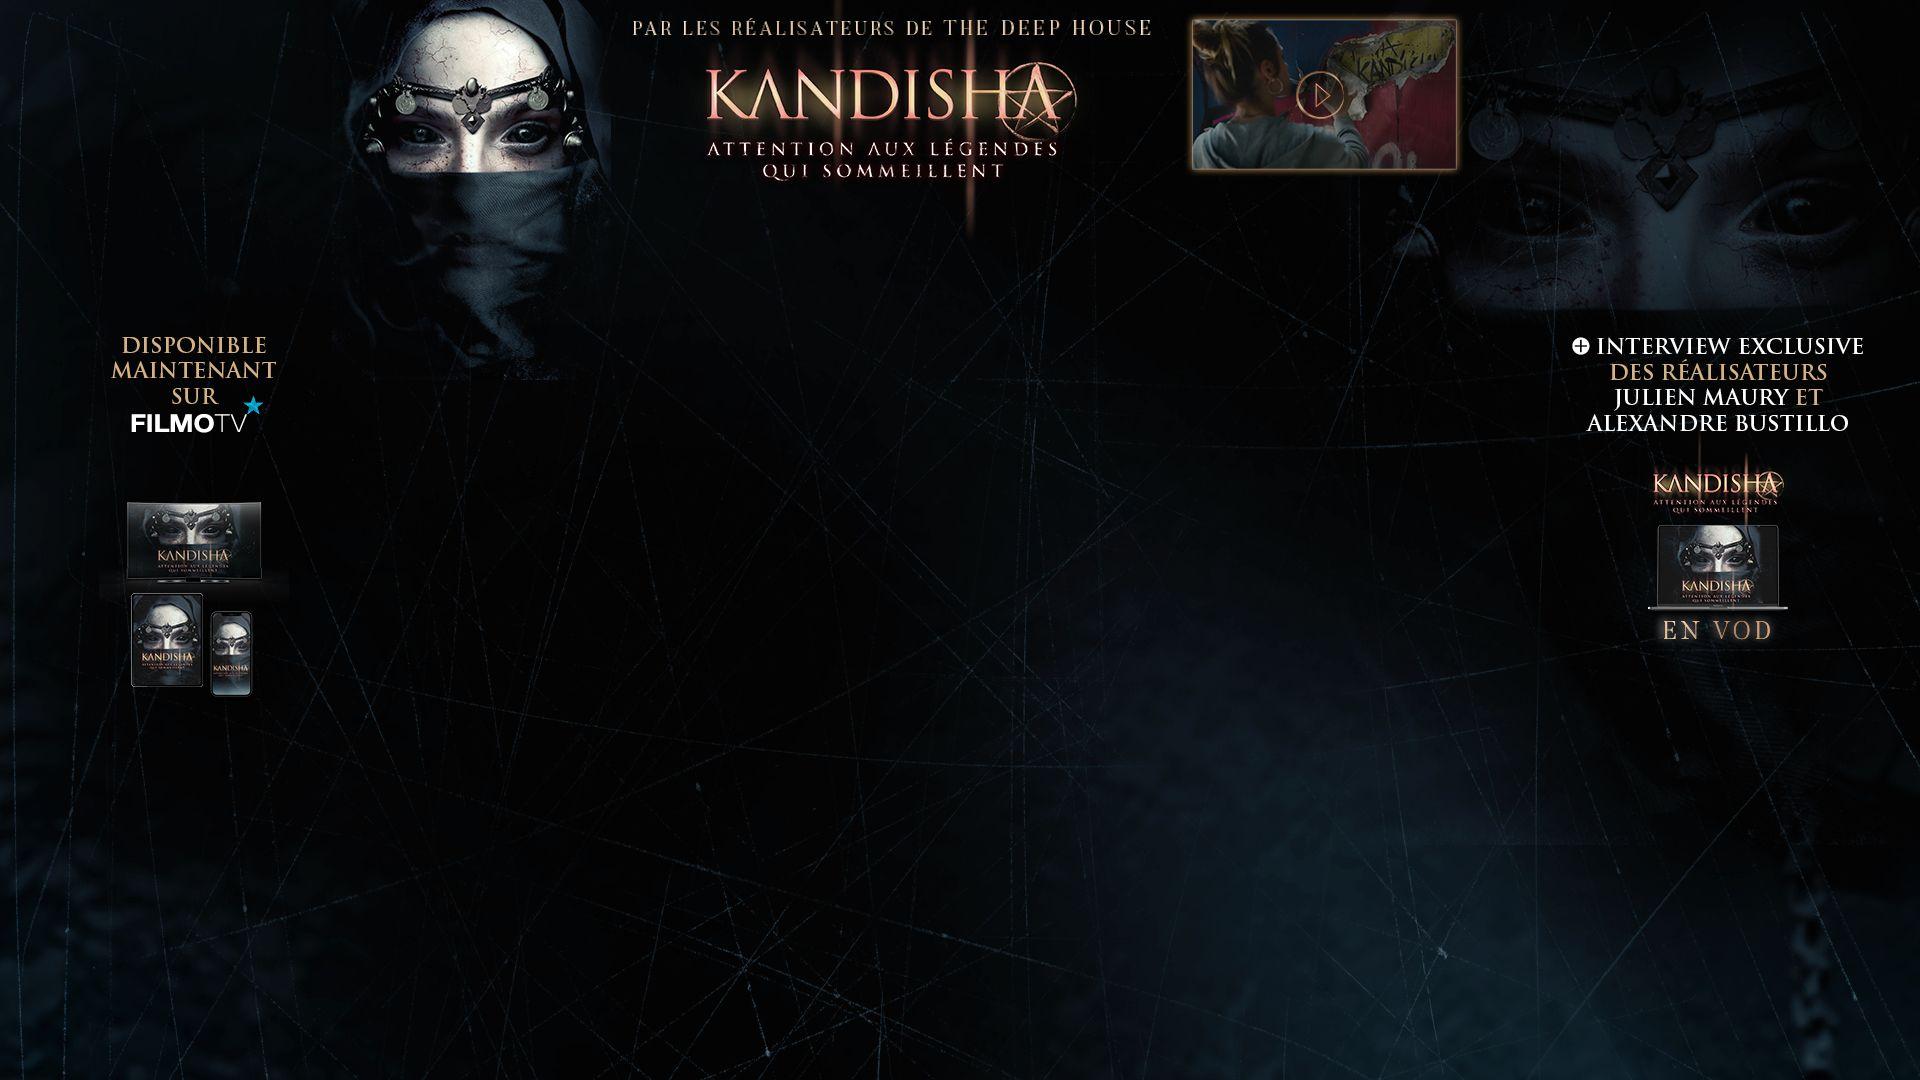 kandisha filmo juillet 2021